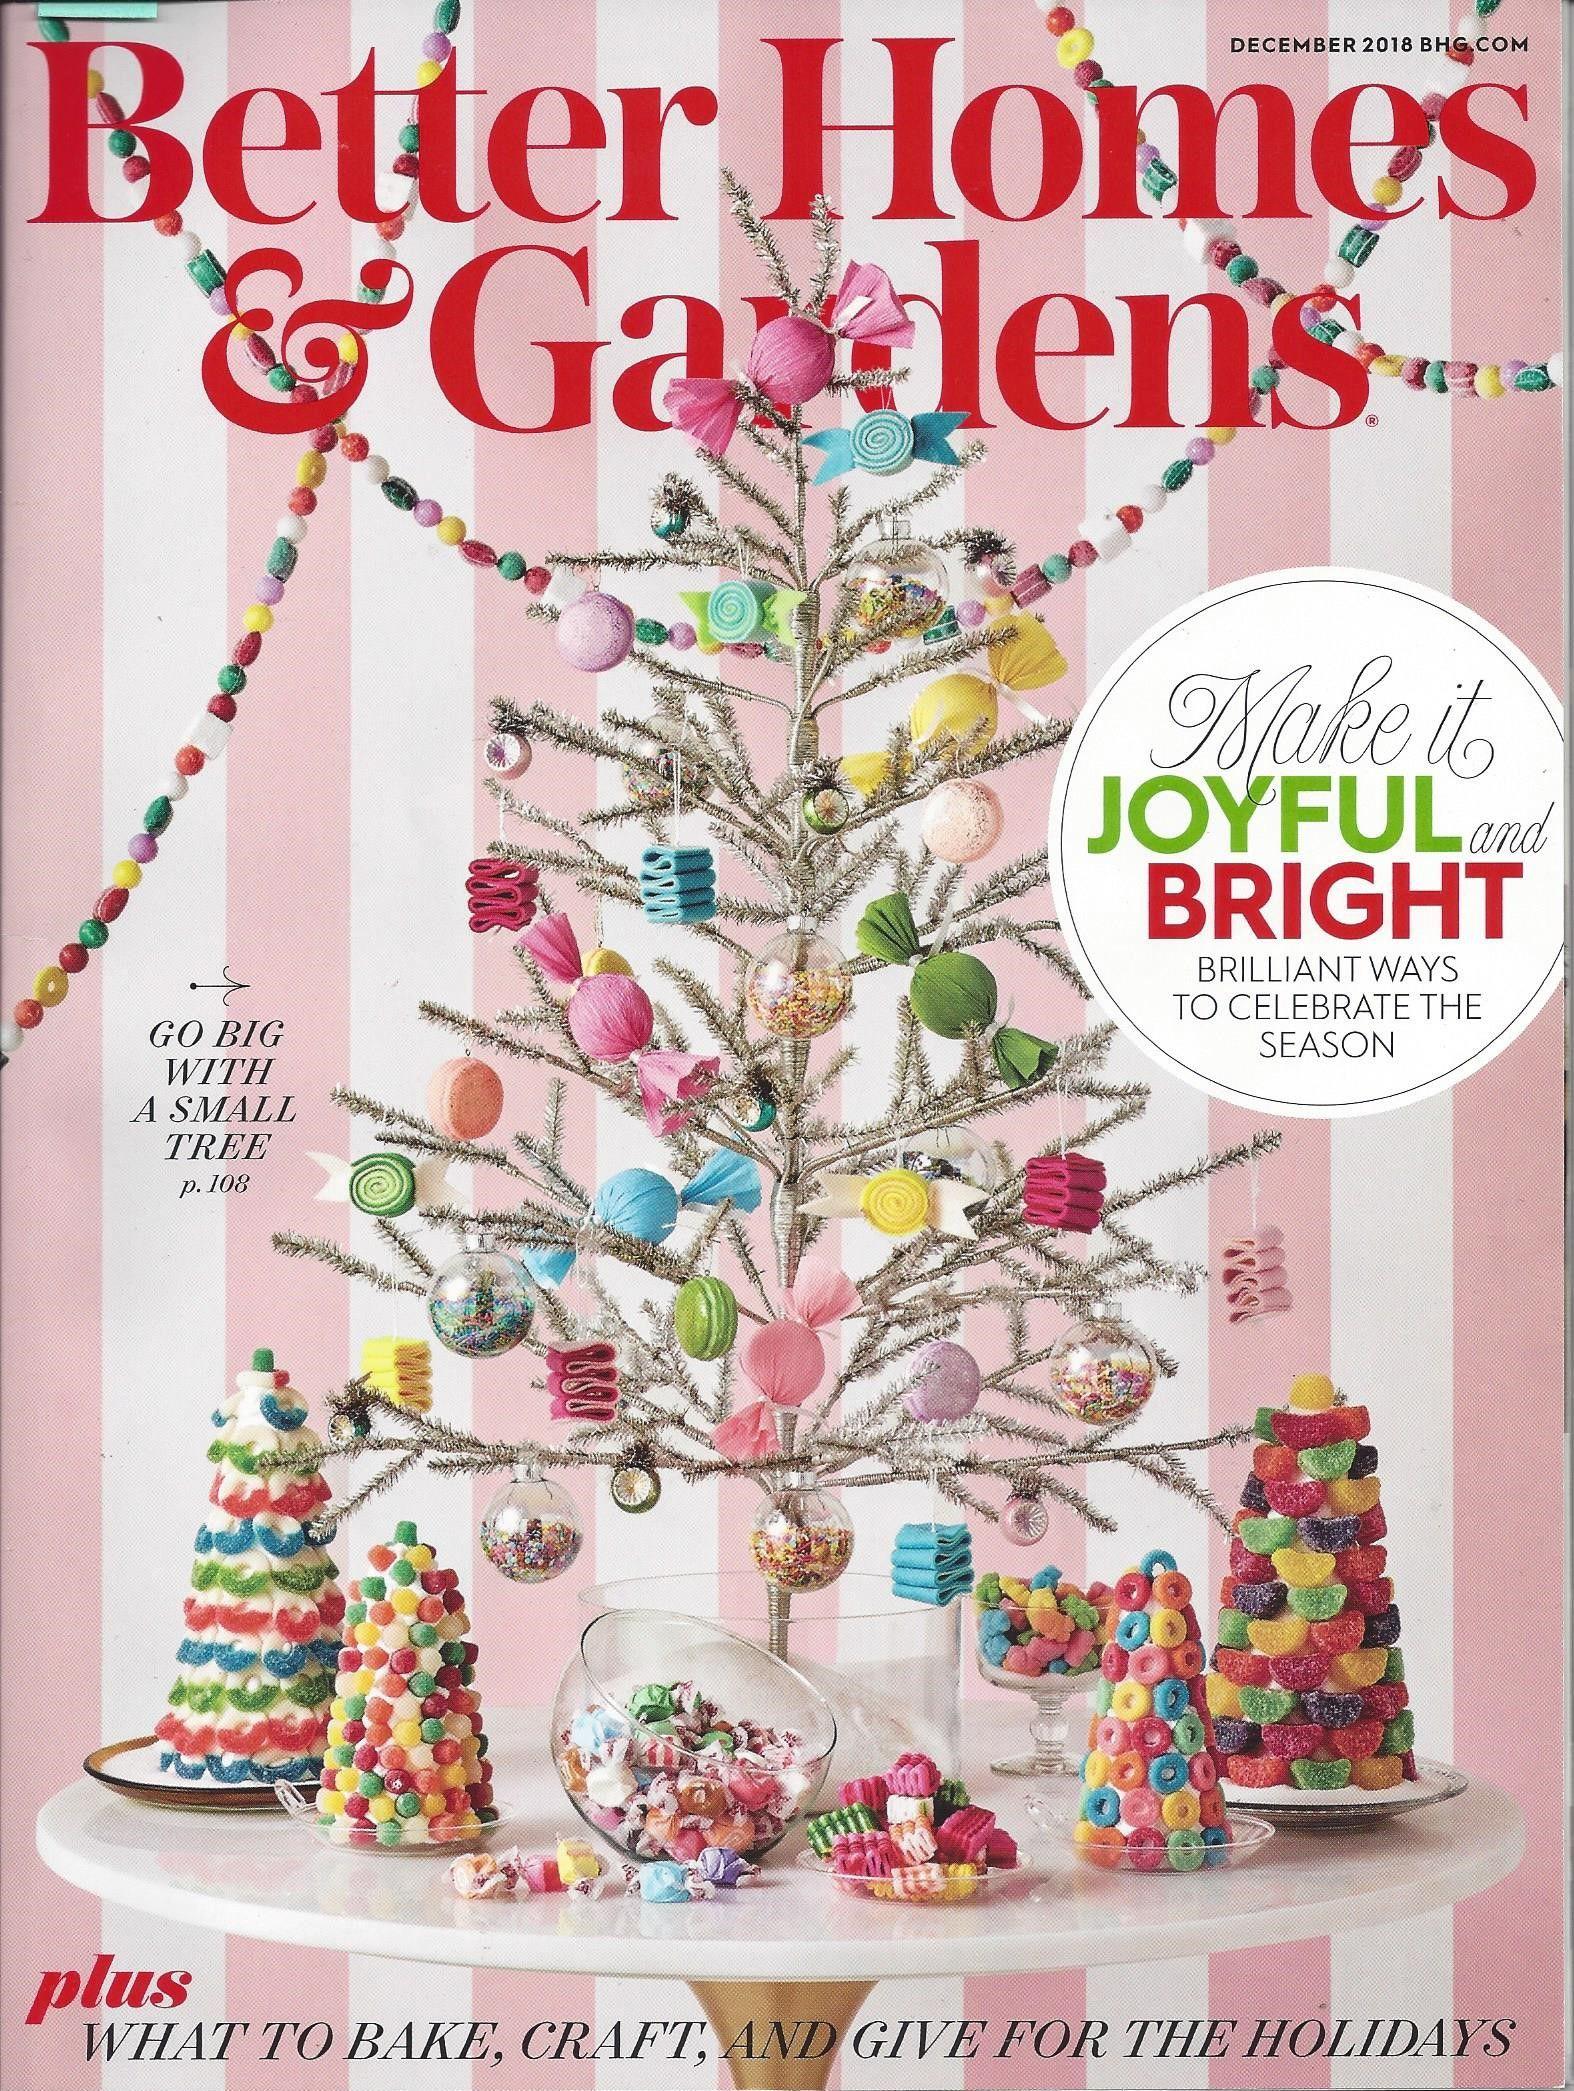 a4d0d30ec0bd4bf64ec03c32f0e645e9 - Better Homes And Gardens Christmas Cookbook